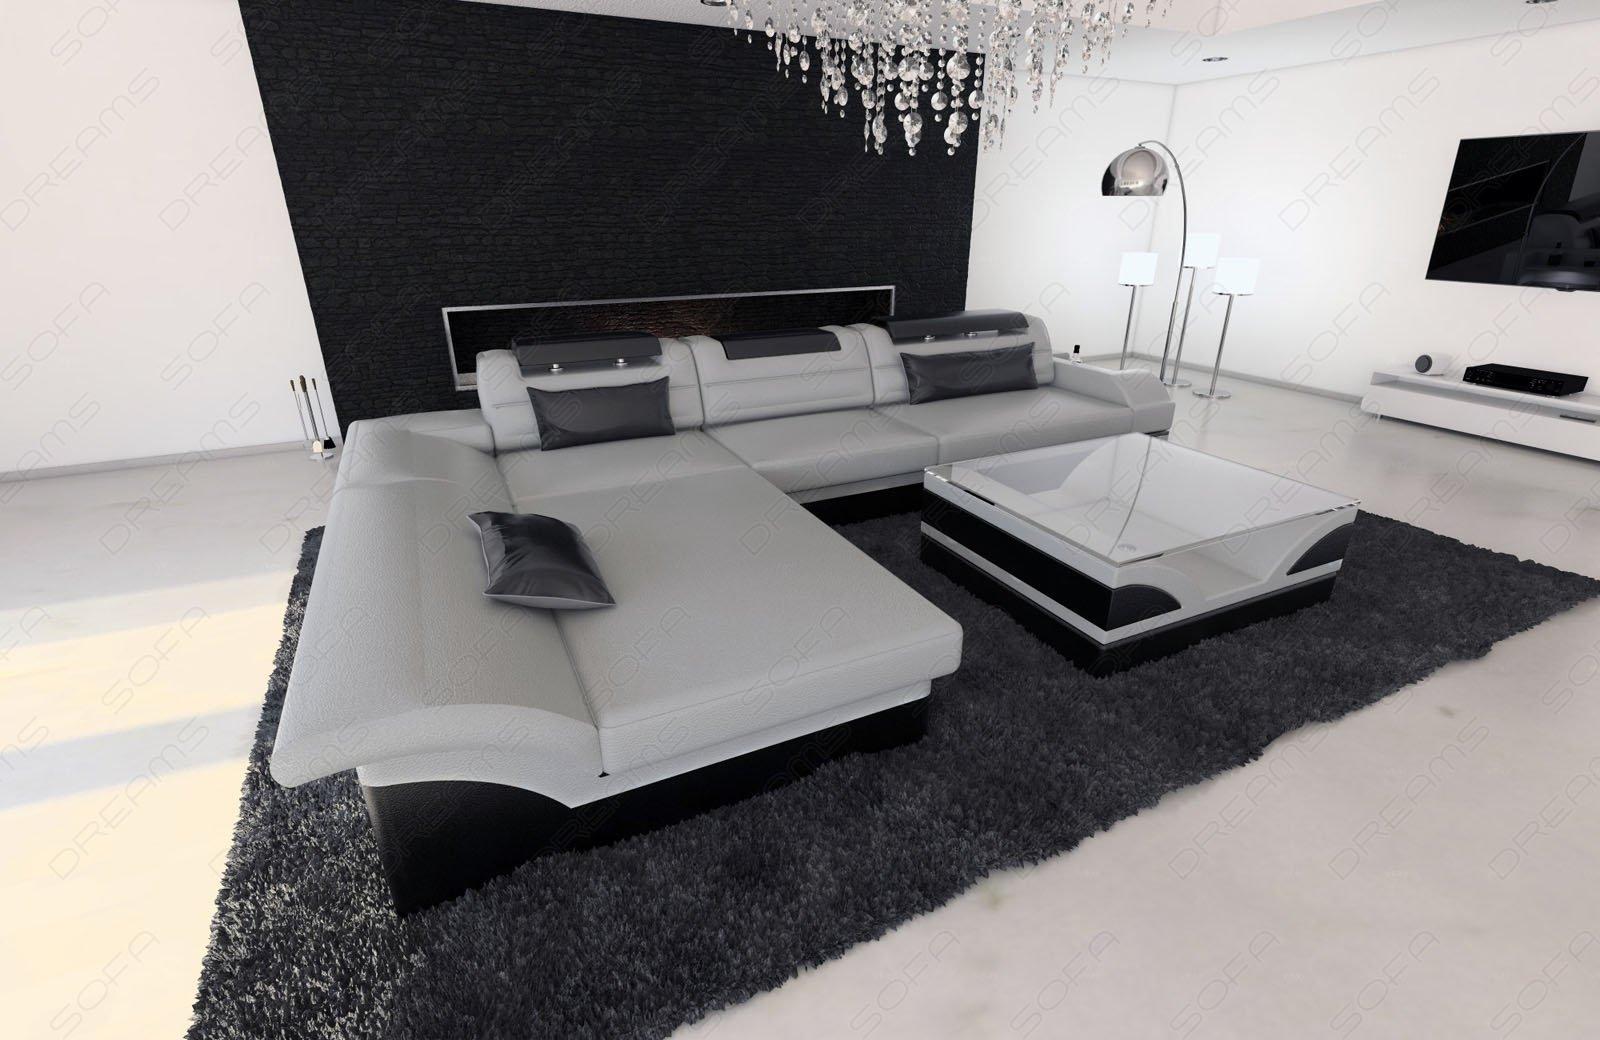 ledercouch kaufen excellent full size of sofa couch modernes design ledersofa ledercouch kaufen. Black Bedroom Furniture Sets. Home Design Ideas